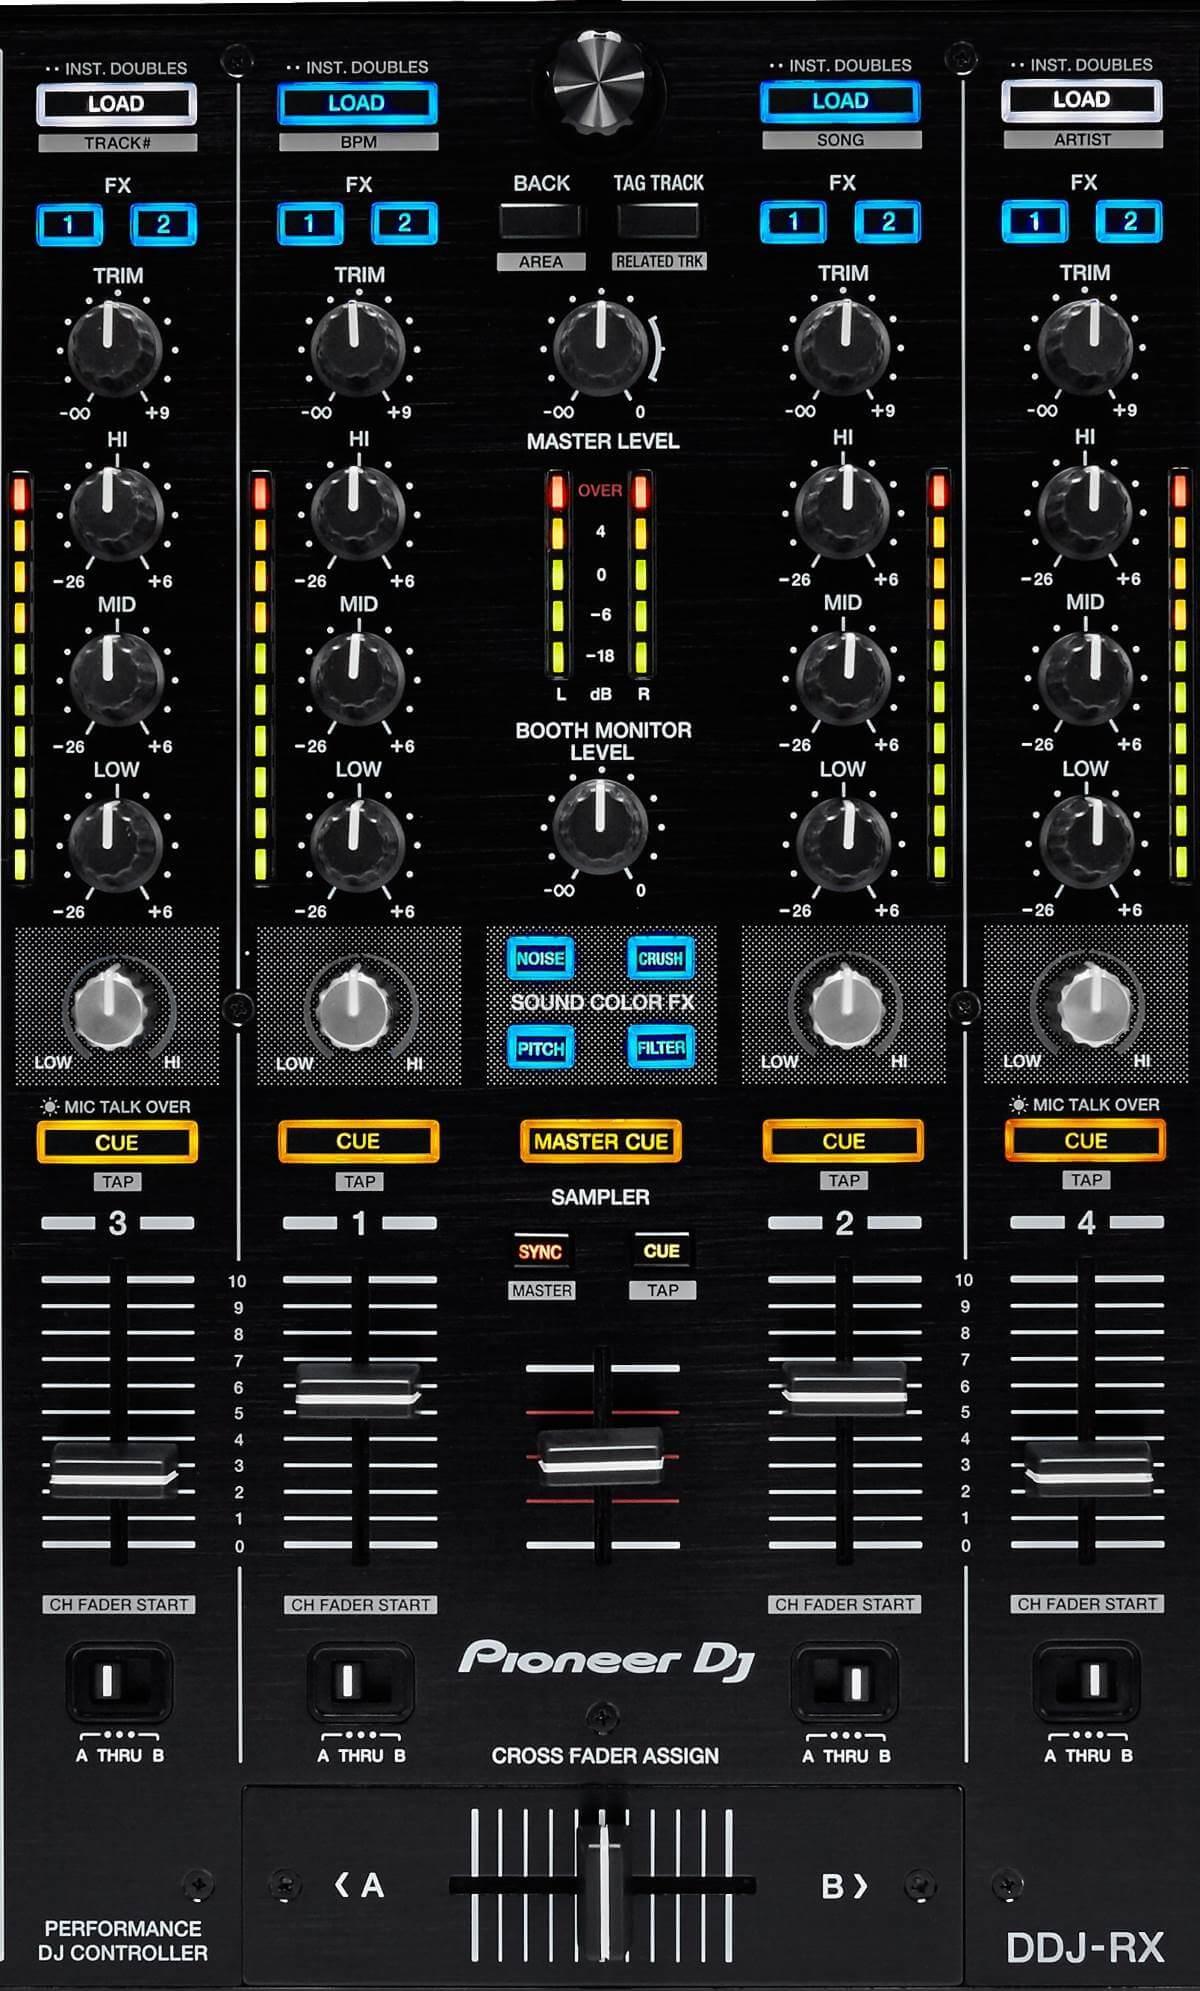 Pioneer DJ DDJ-RX mixer section